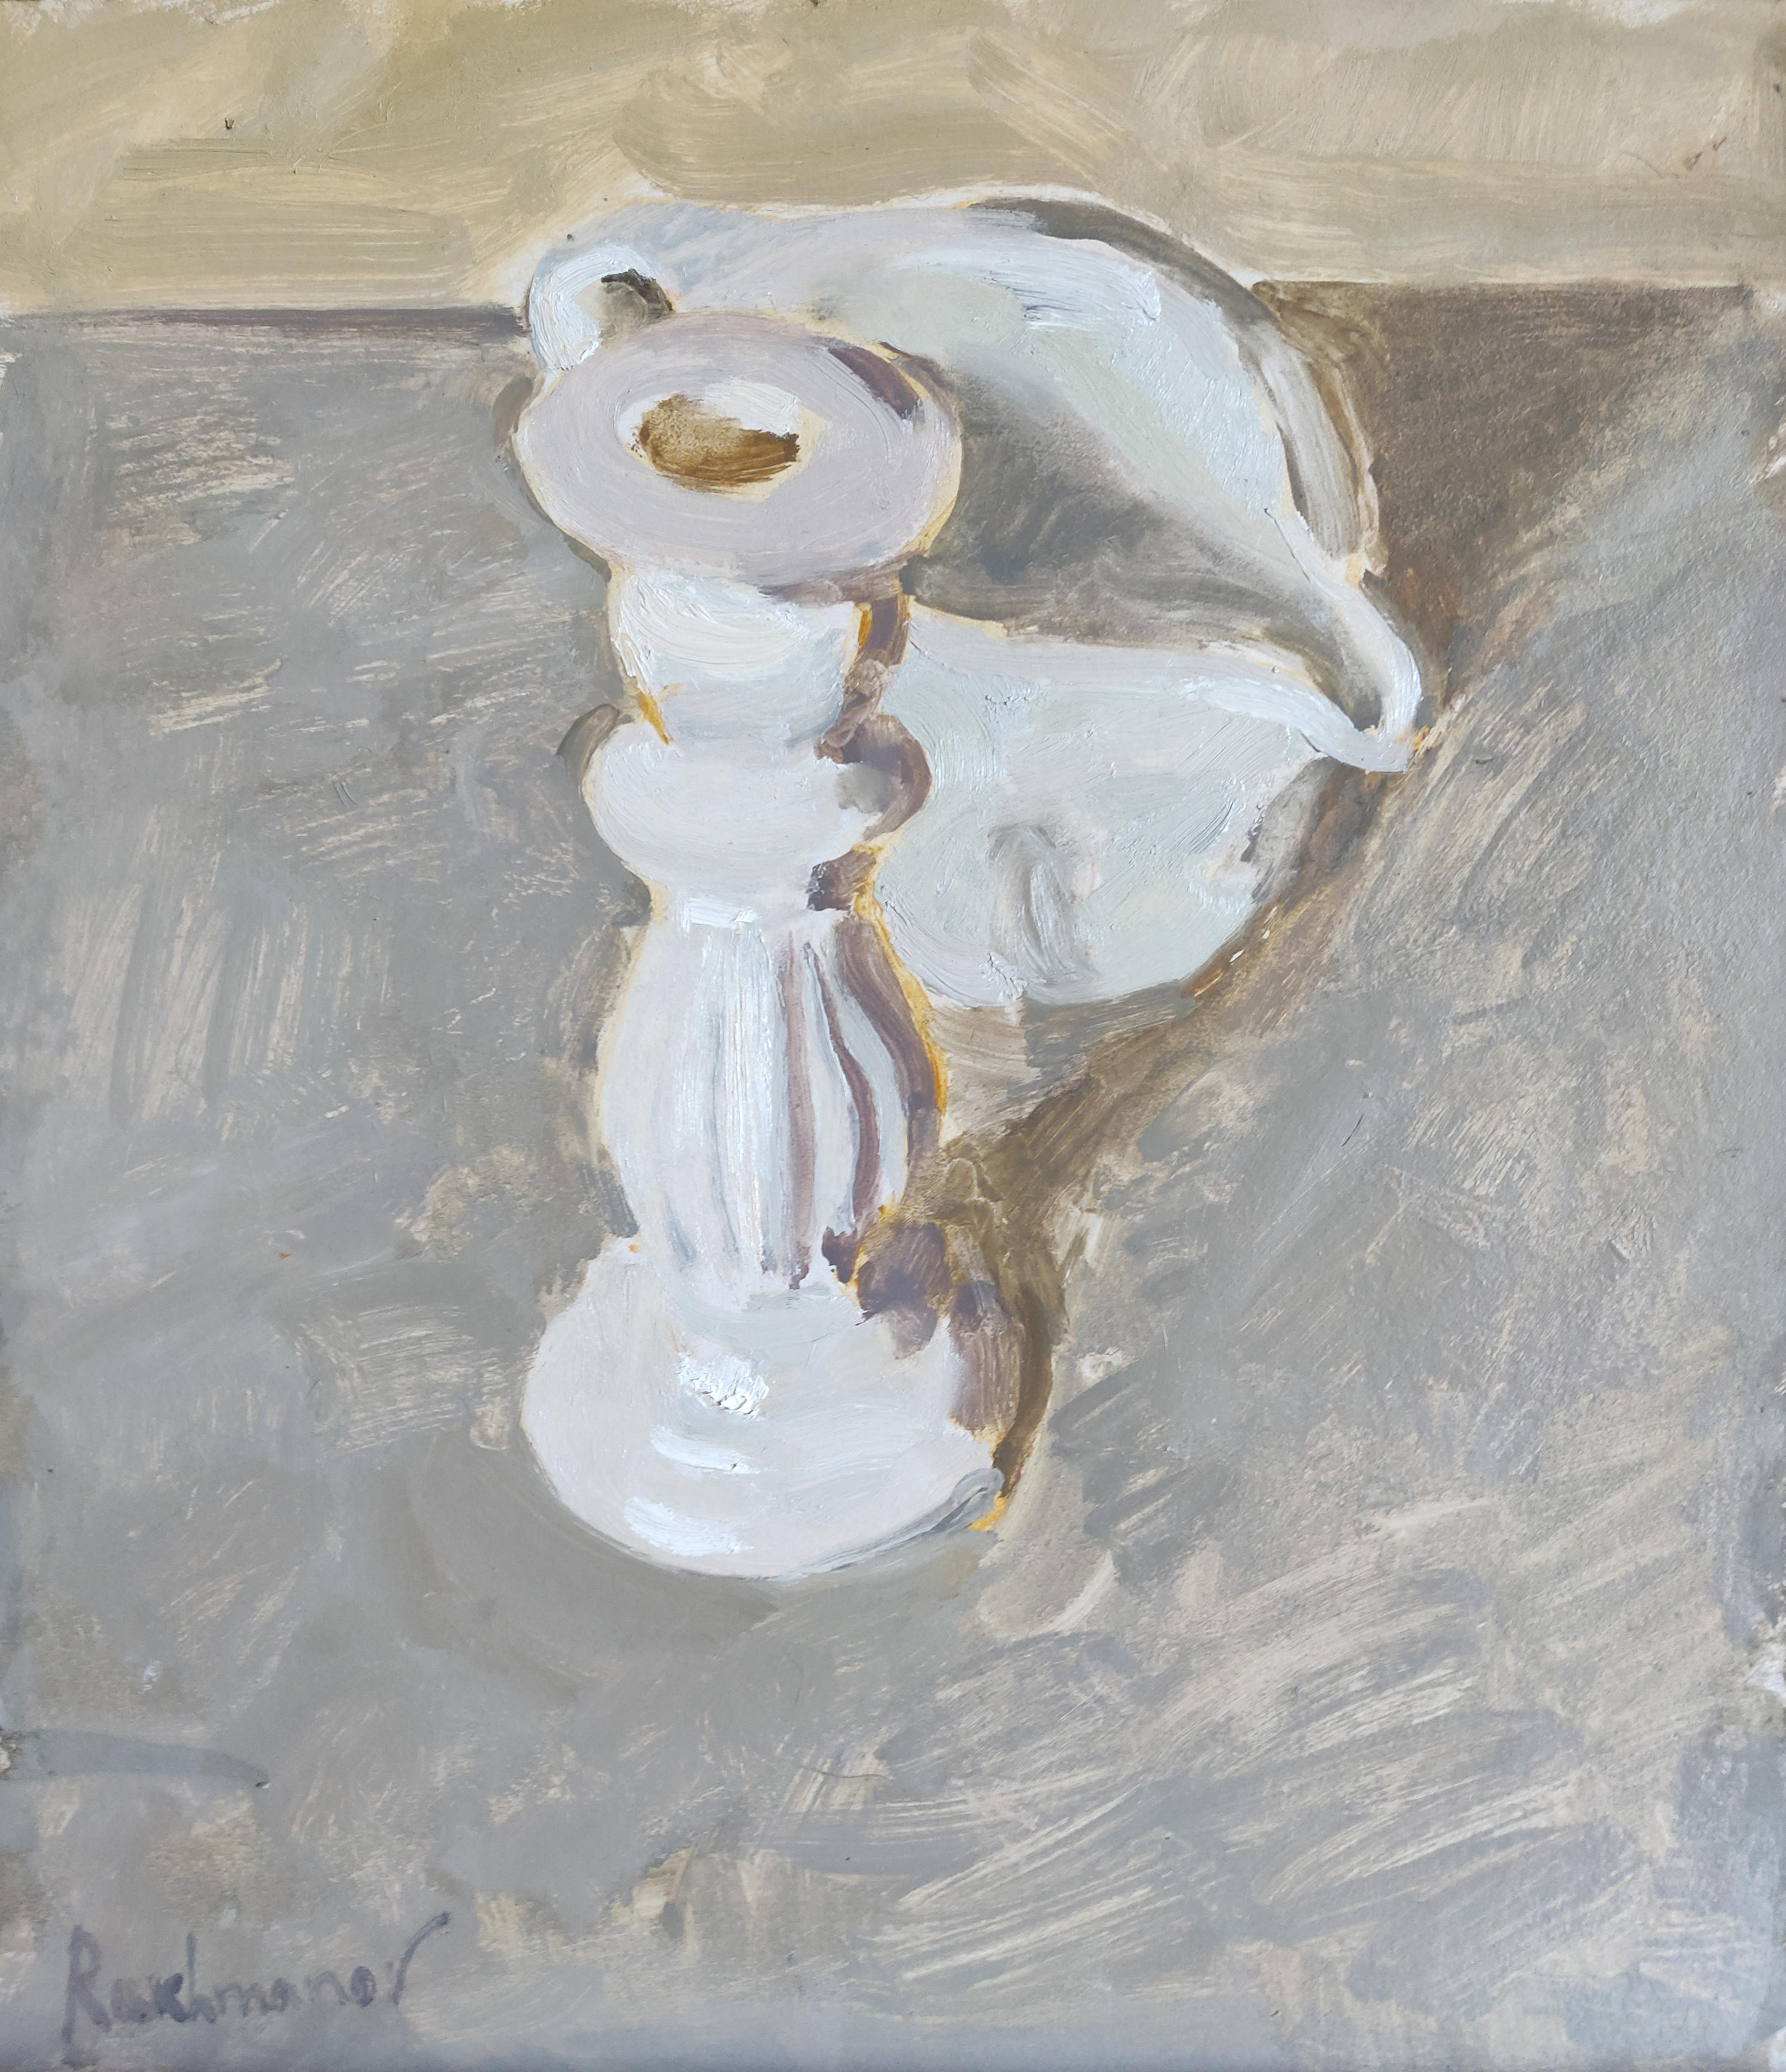 Still Life №10 - 21st Century Contemporary Minimalist Oil Painting